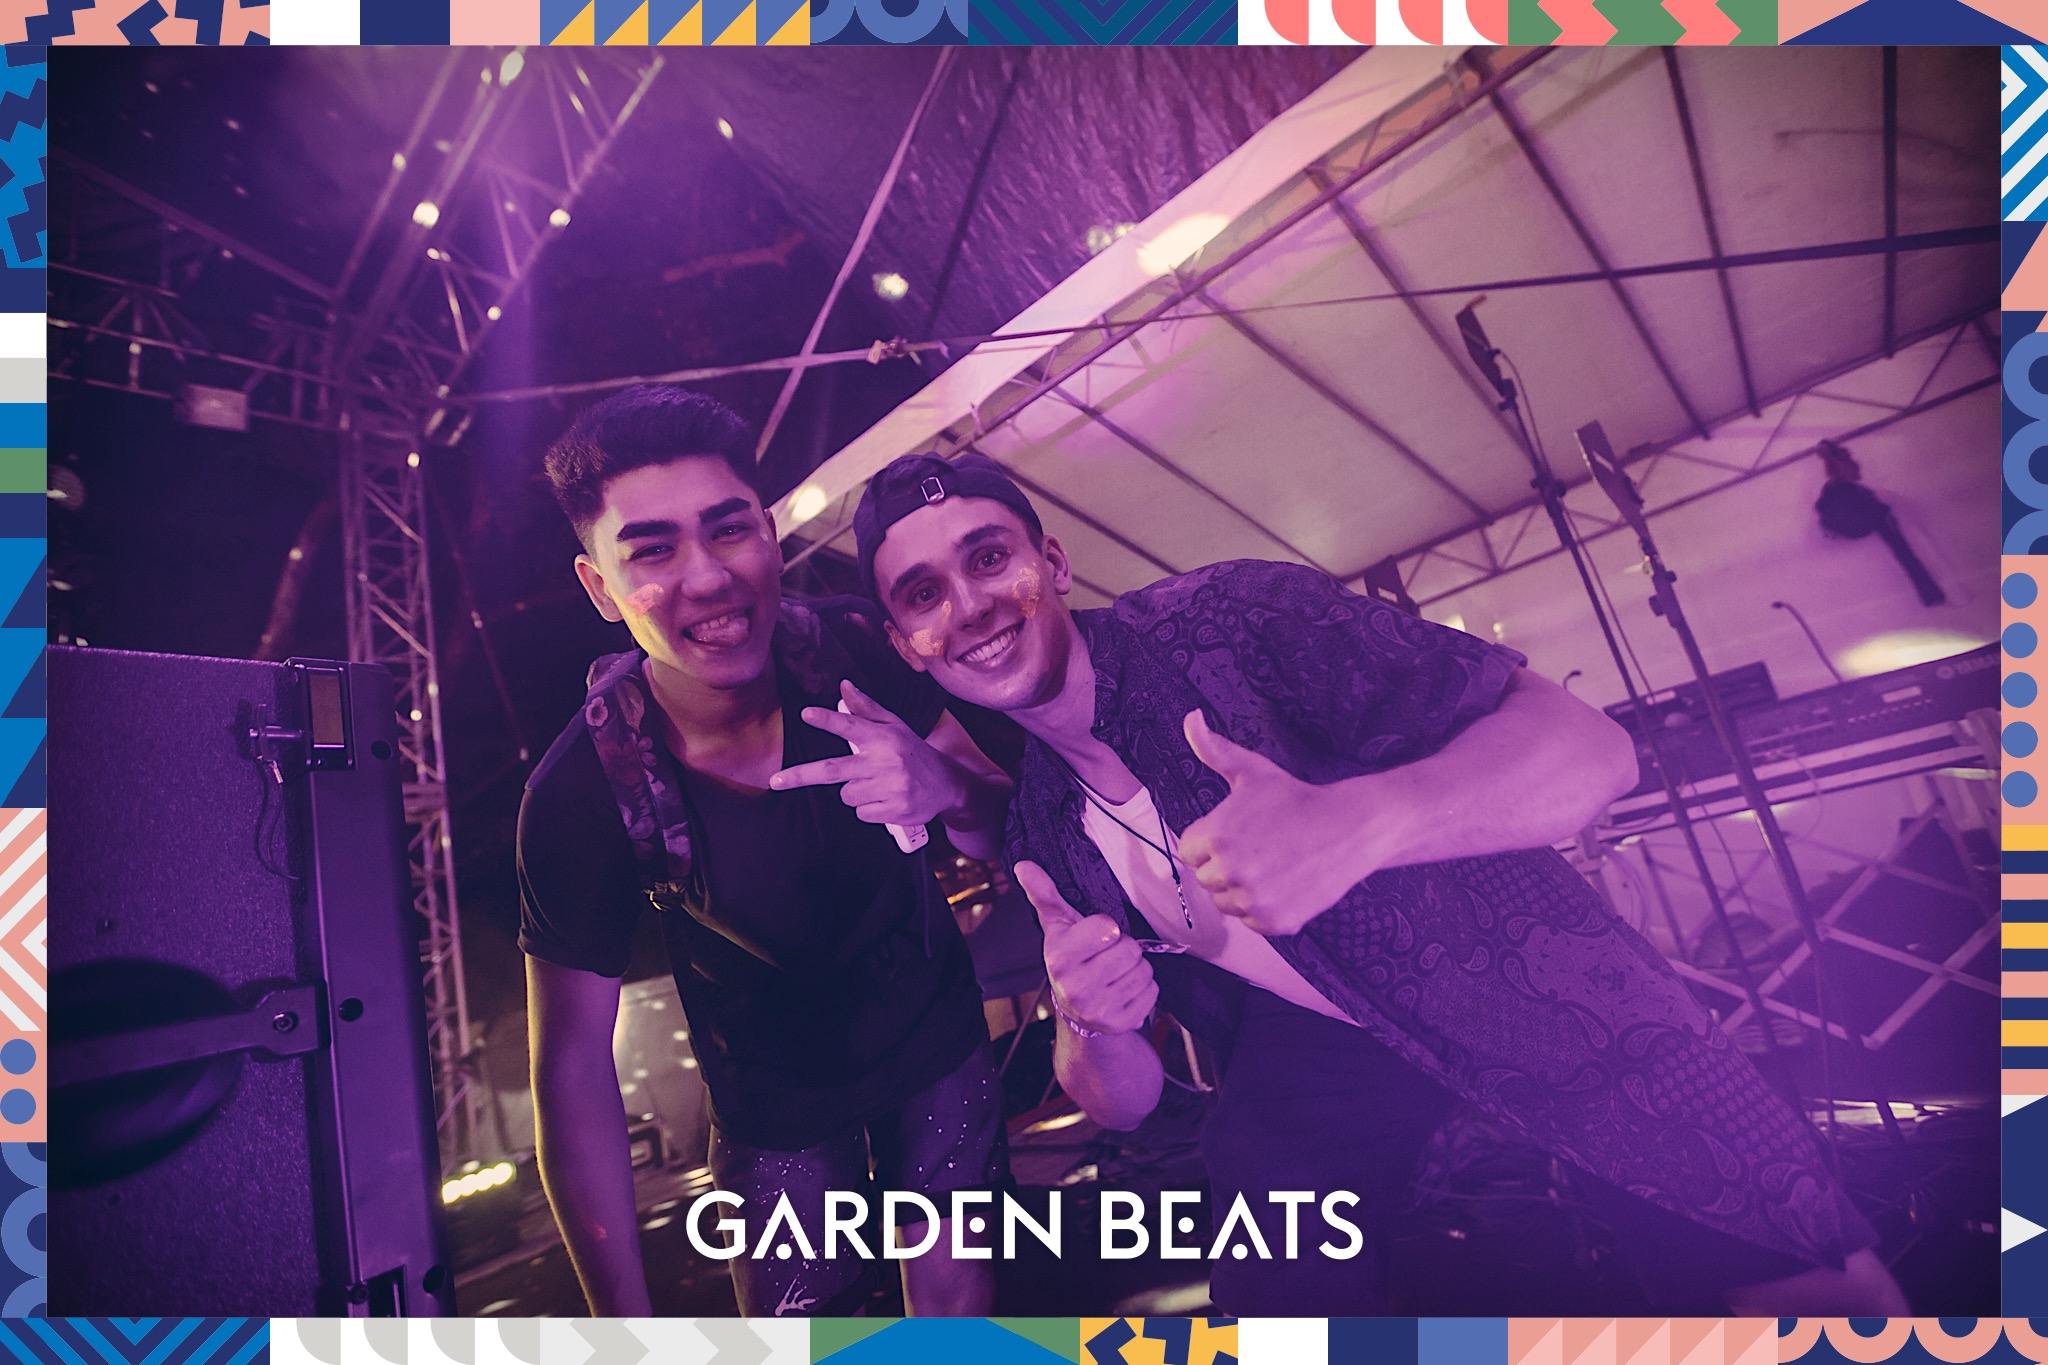 03032018_GardenBeats_Colossal862_Watermarked.jpg